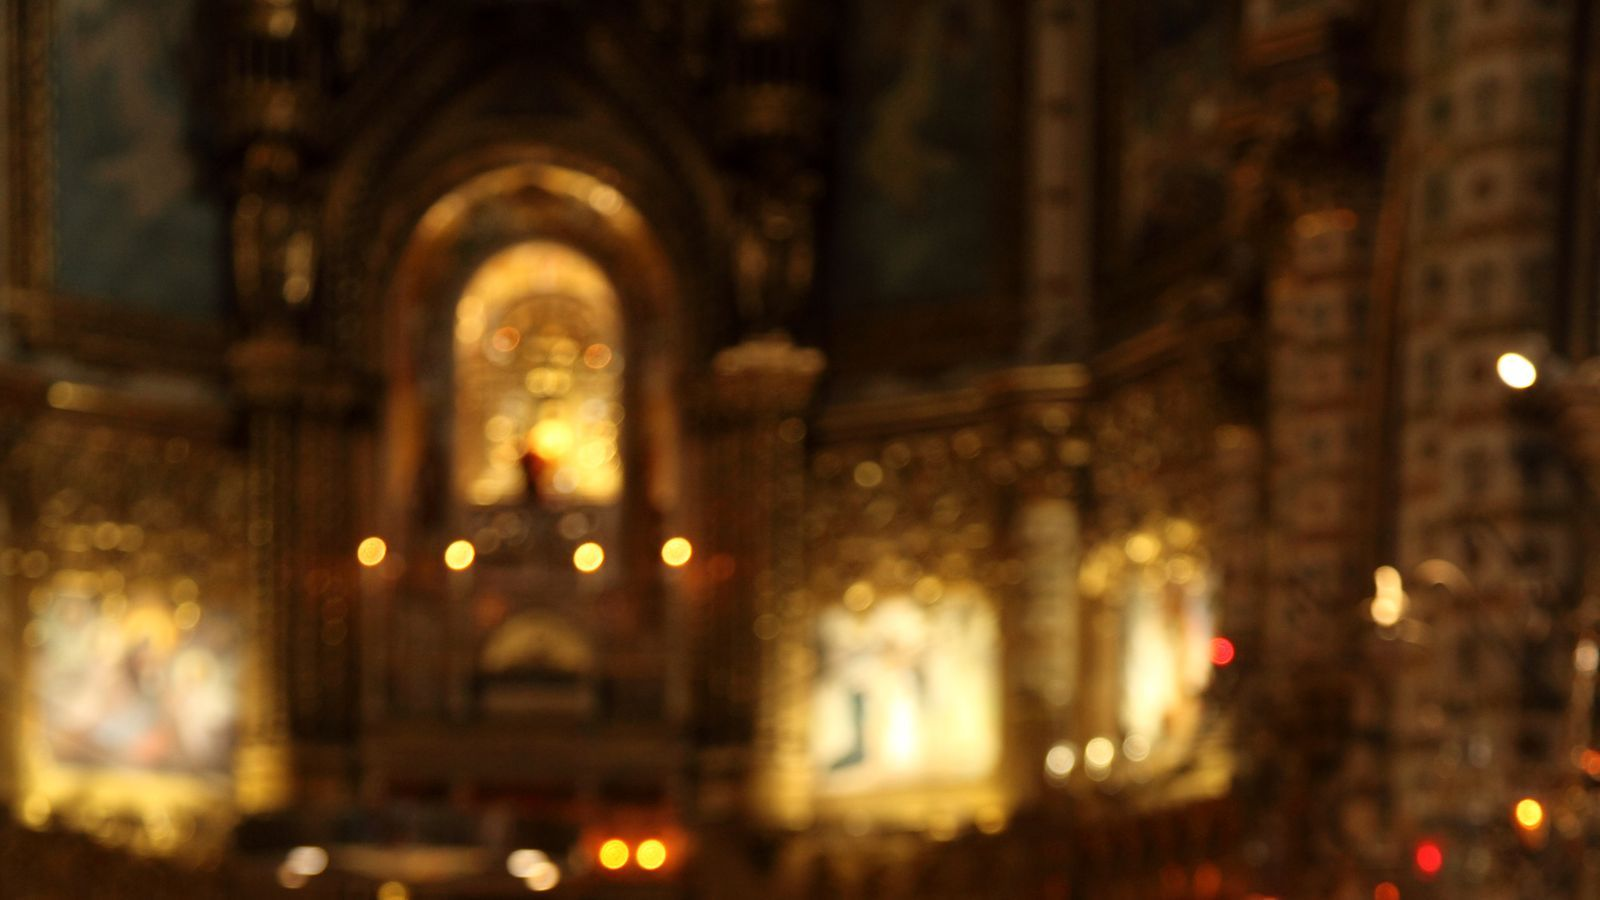 Té futur la religió?